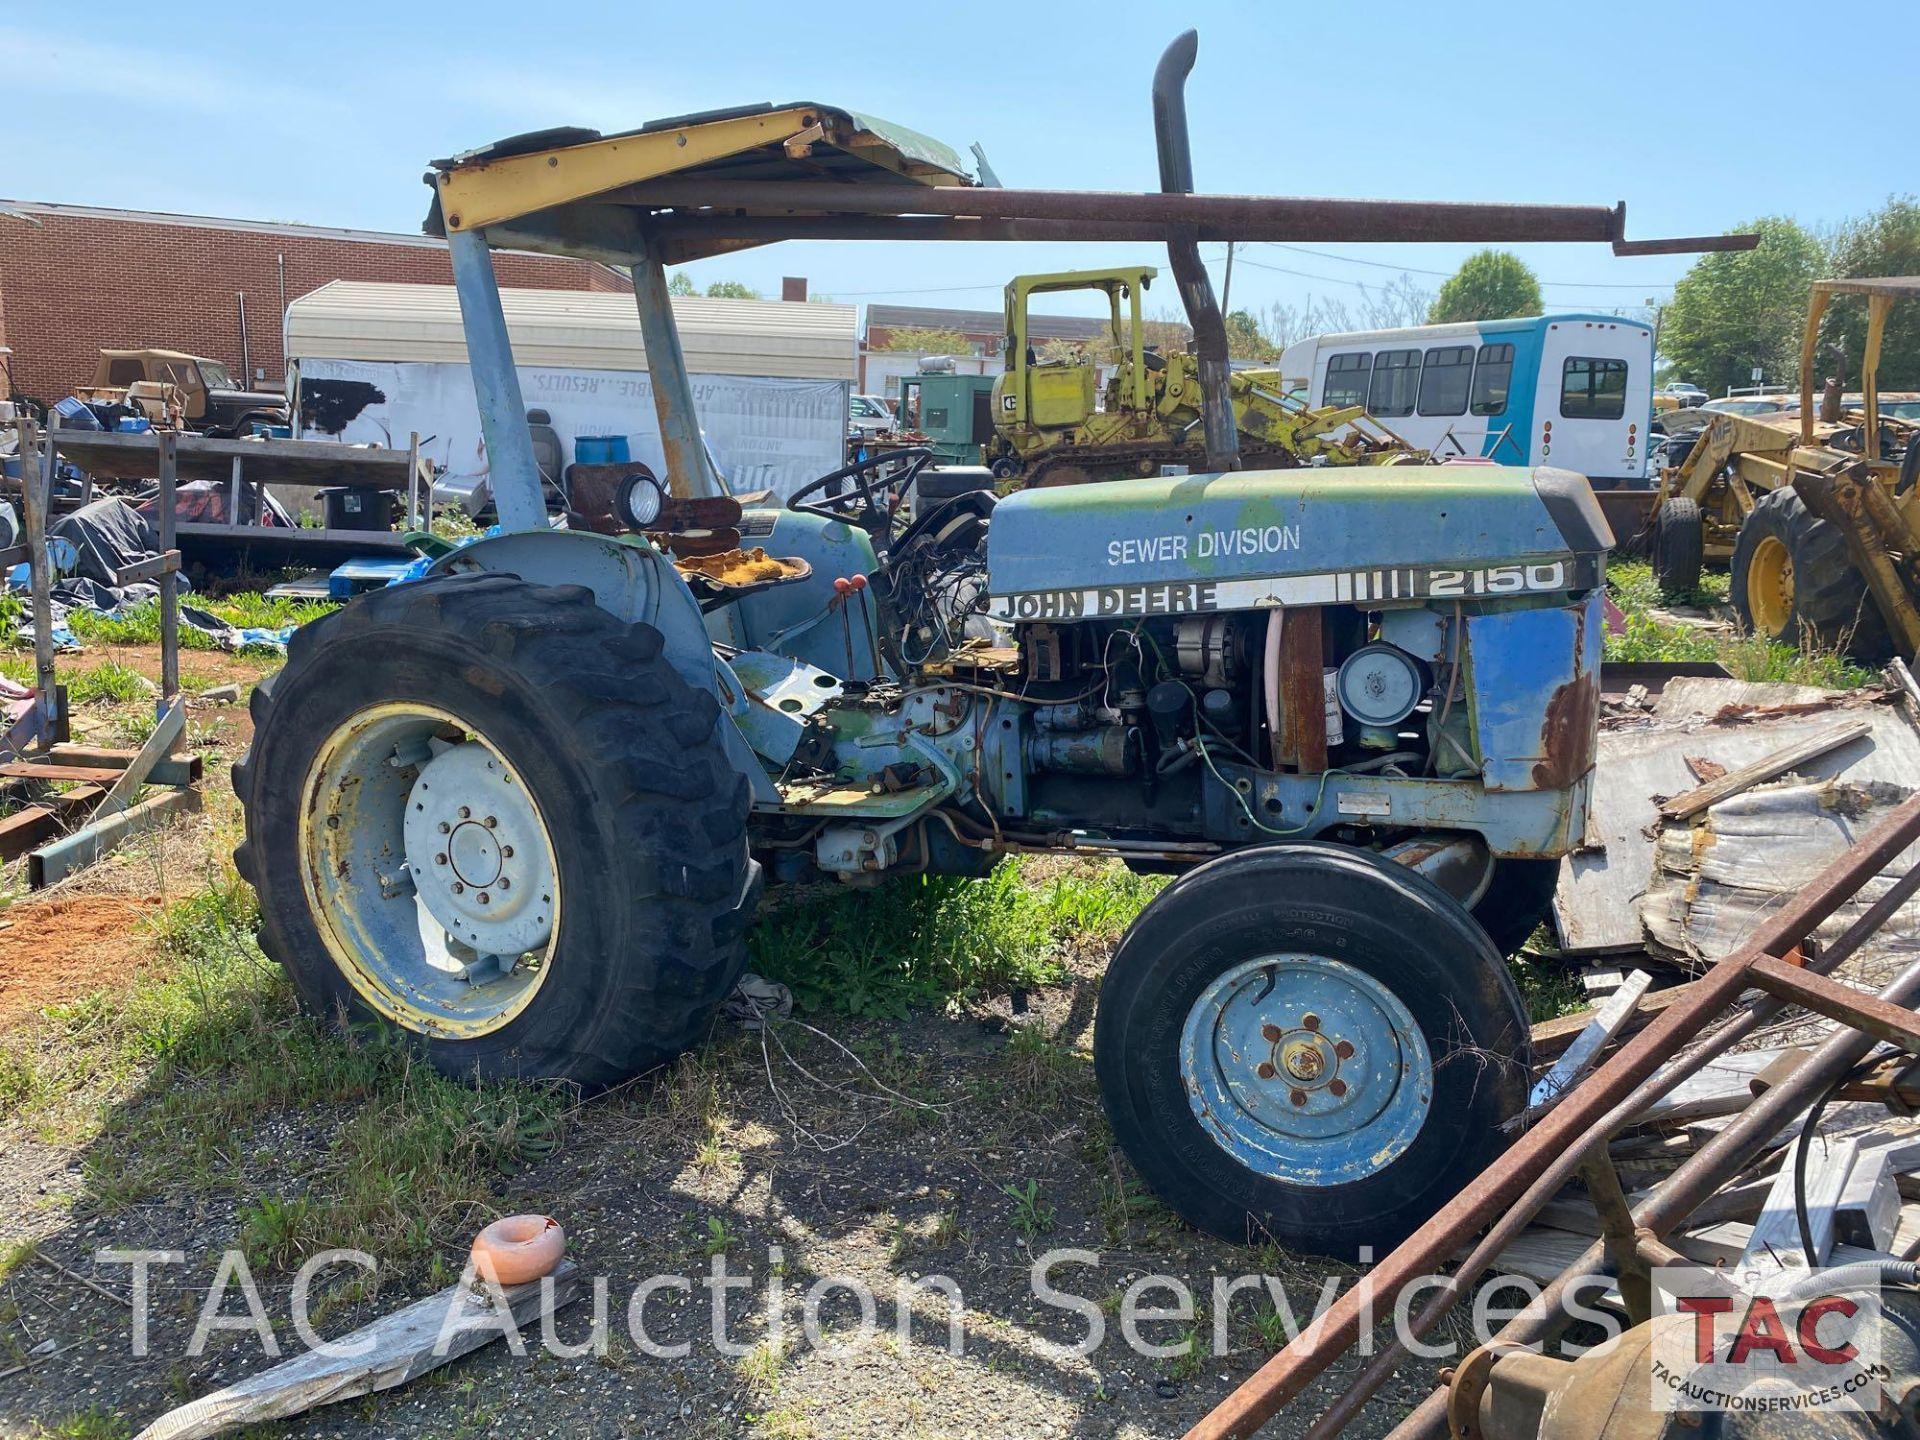 John Deere 2150 Farm Tractor - Image 2 of 34